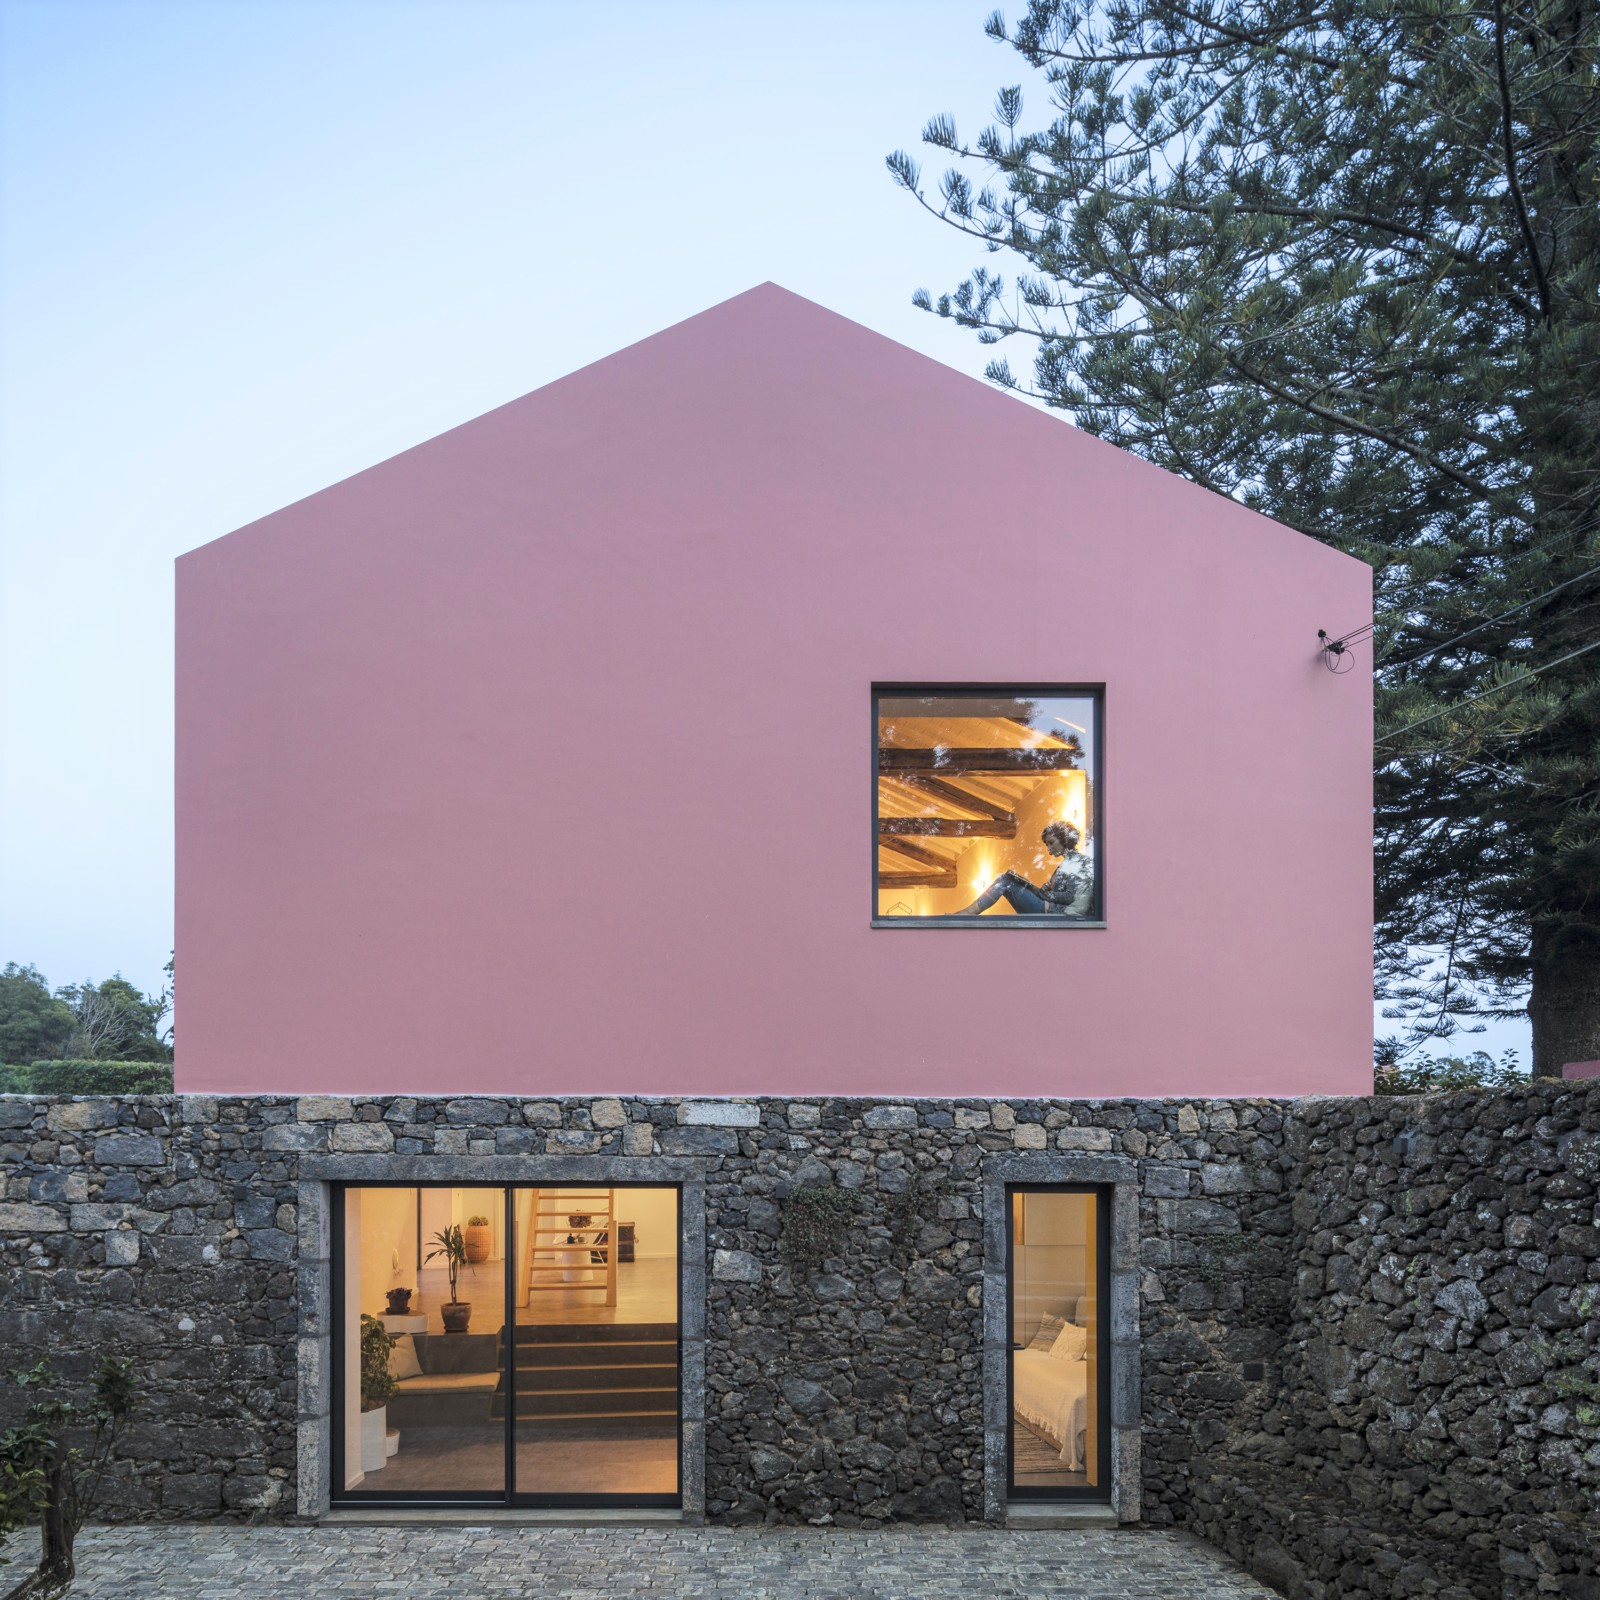 Минимализм в архитектуре и минималистичная архитектура